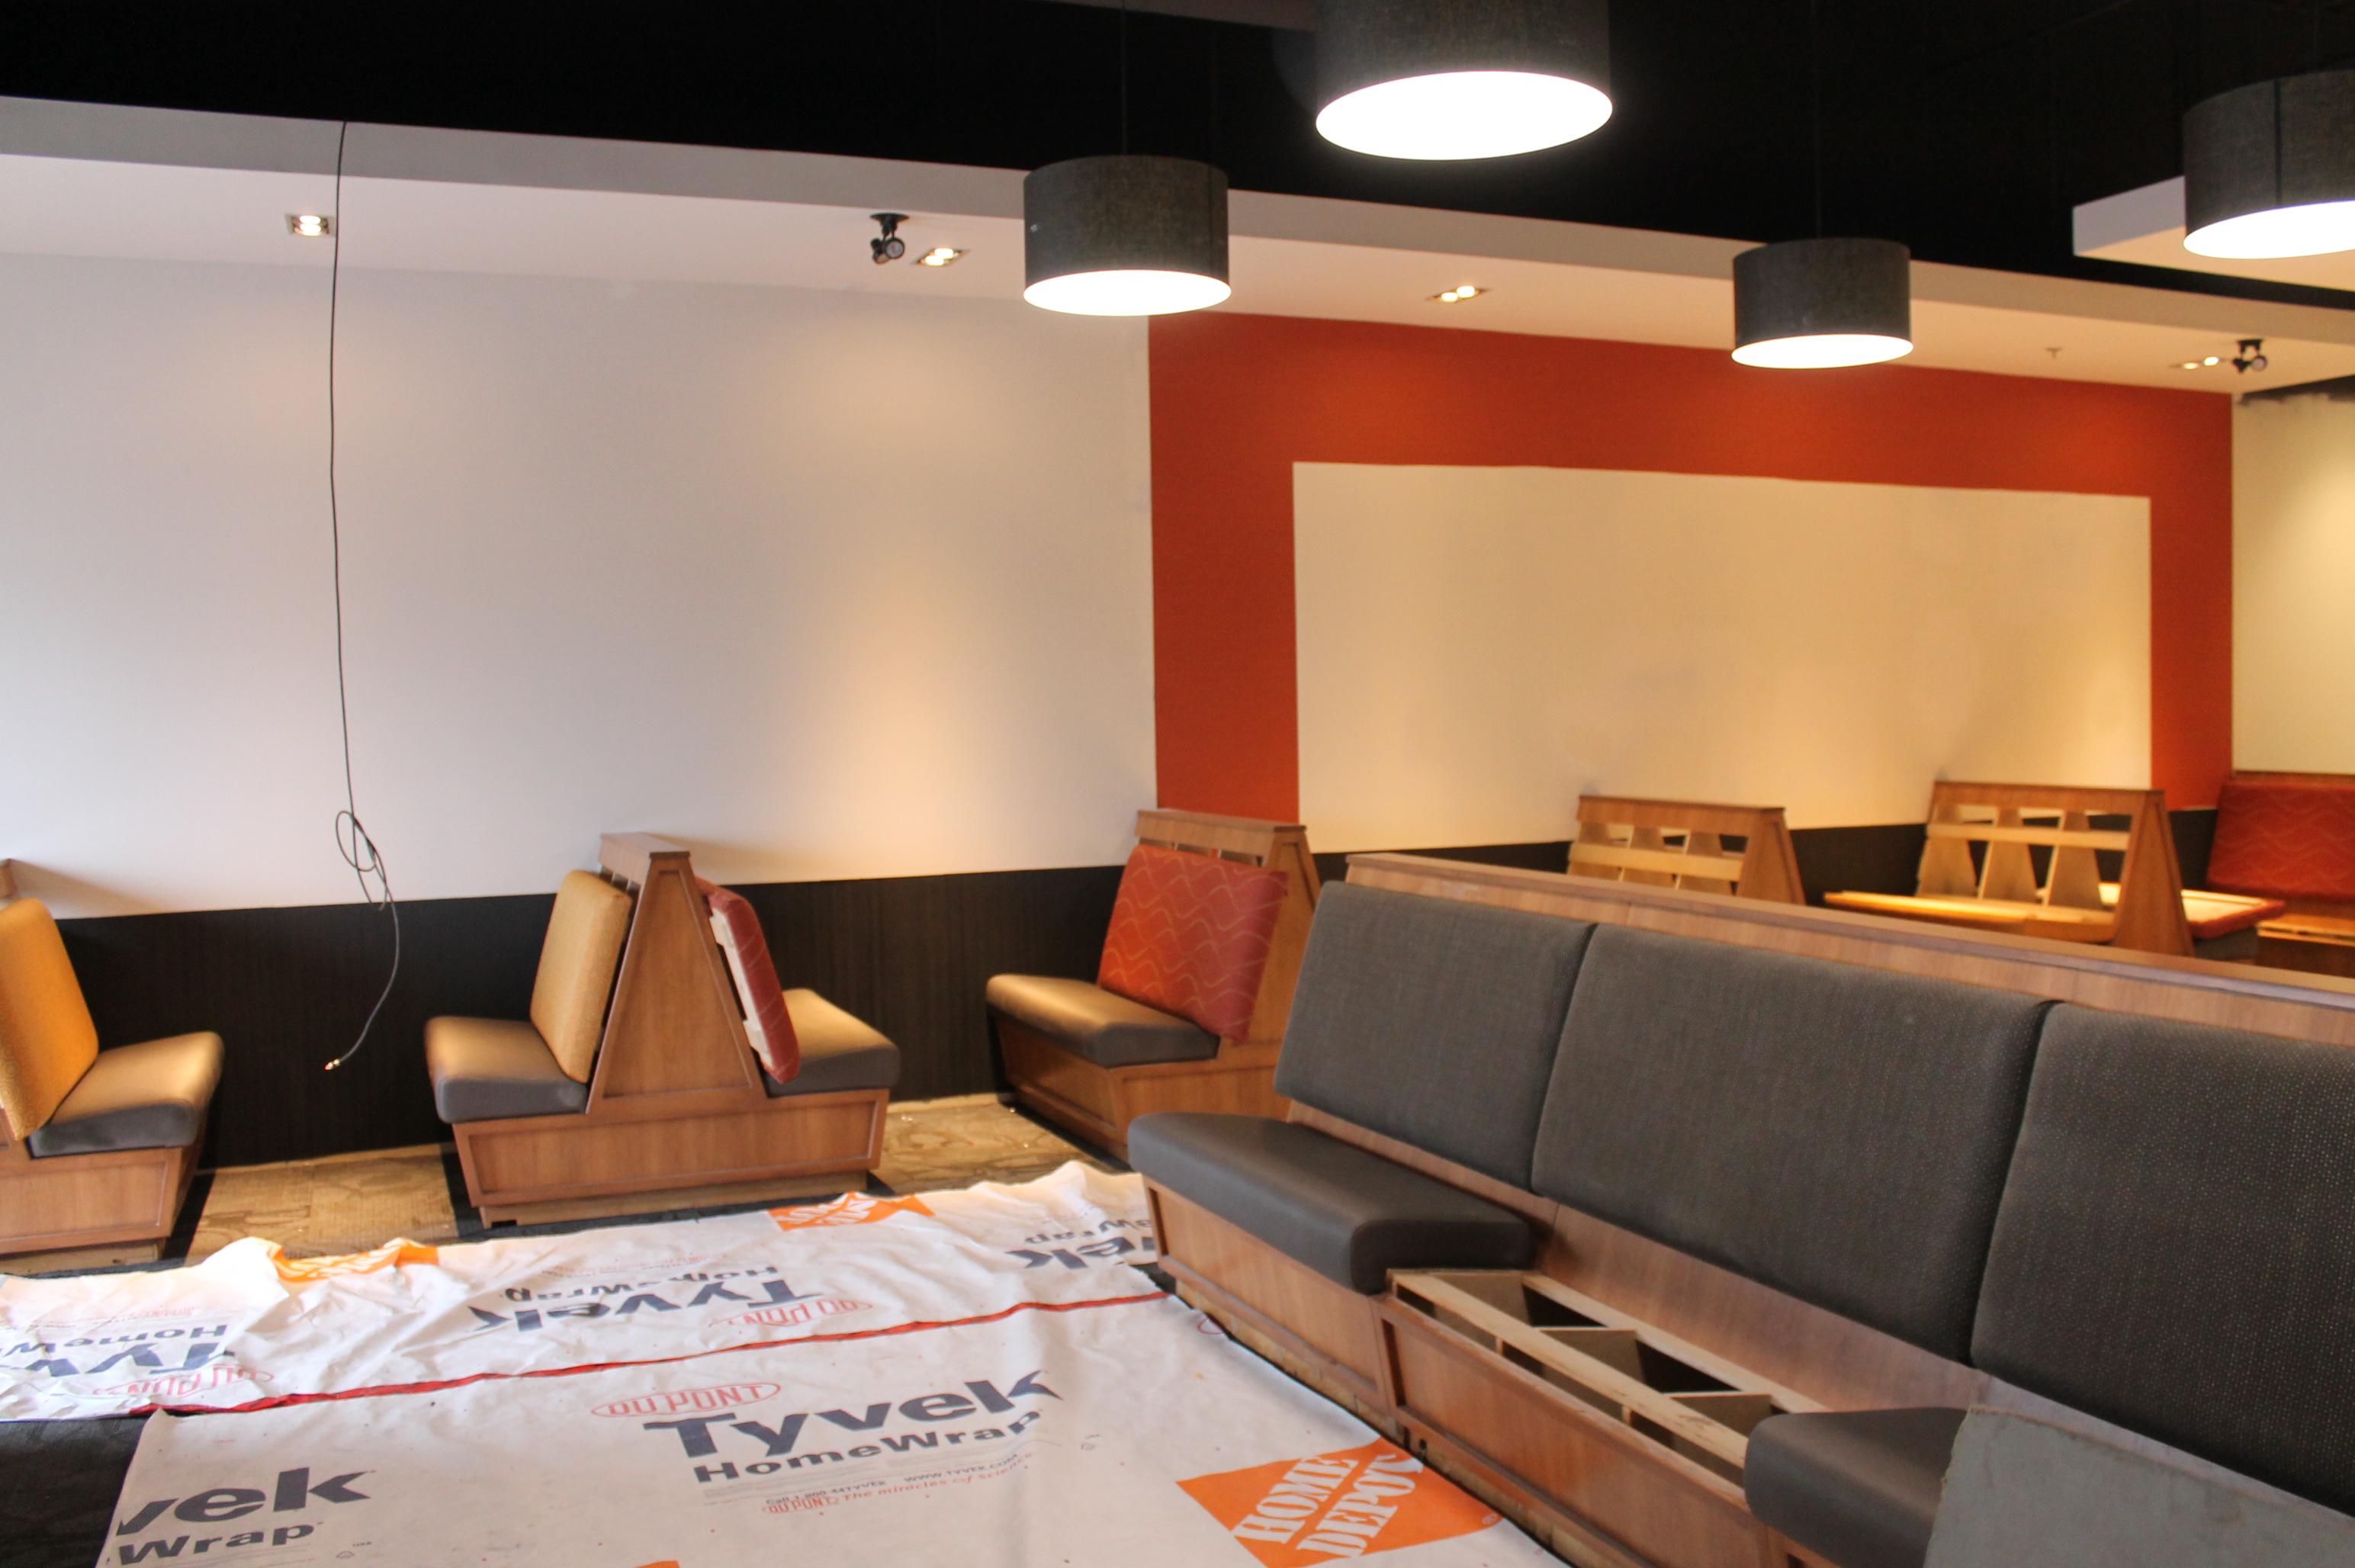 Boston Pizza Restaurant And Bar Opening Soon In Alliston New Tecumseth Times